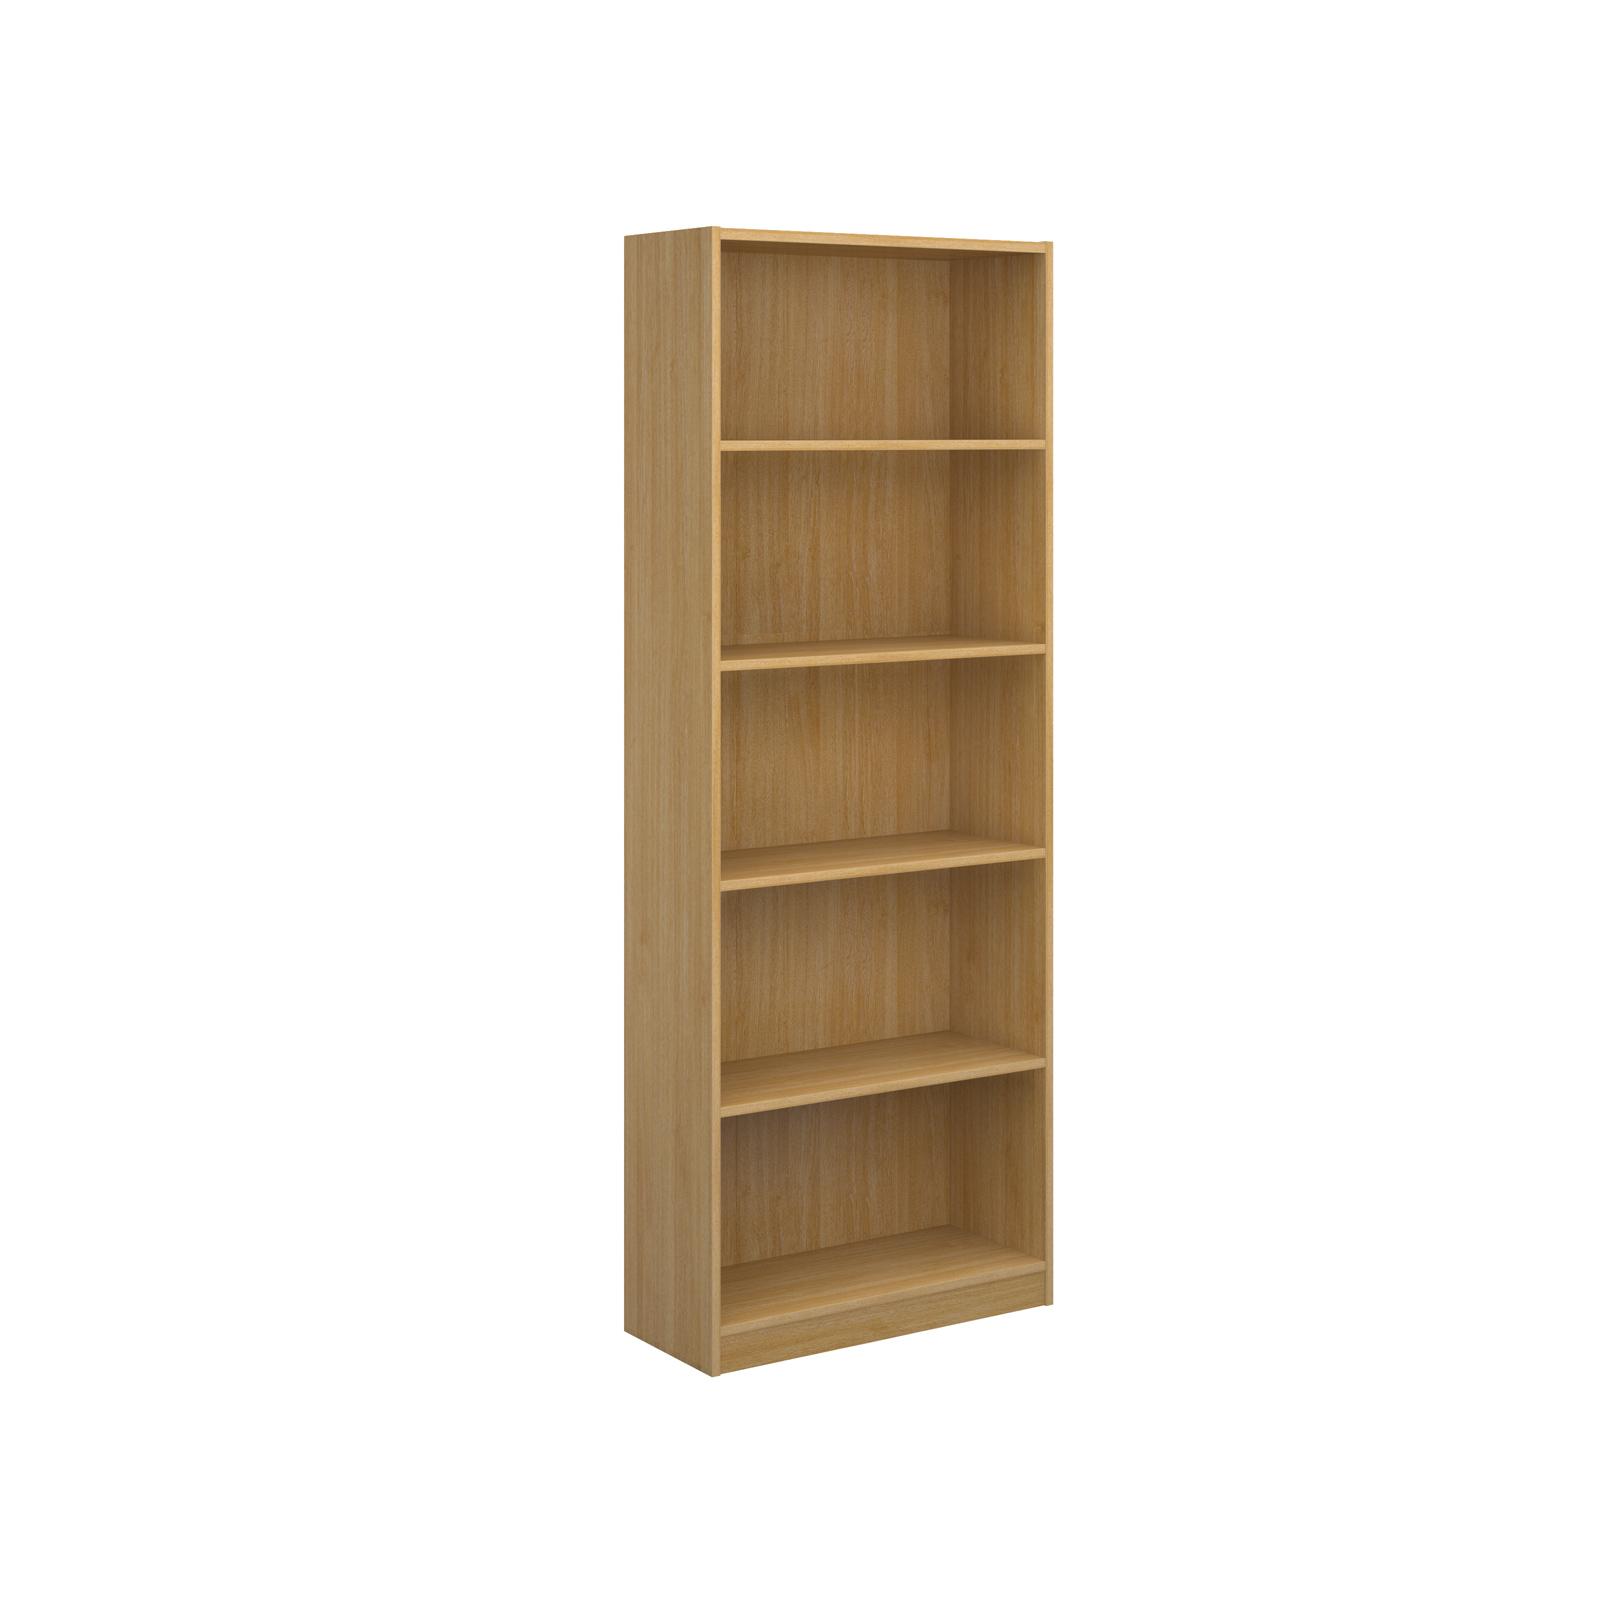 Image for High Bookcase - Oak